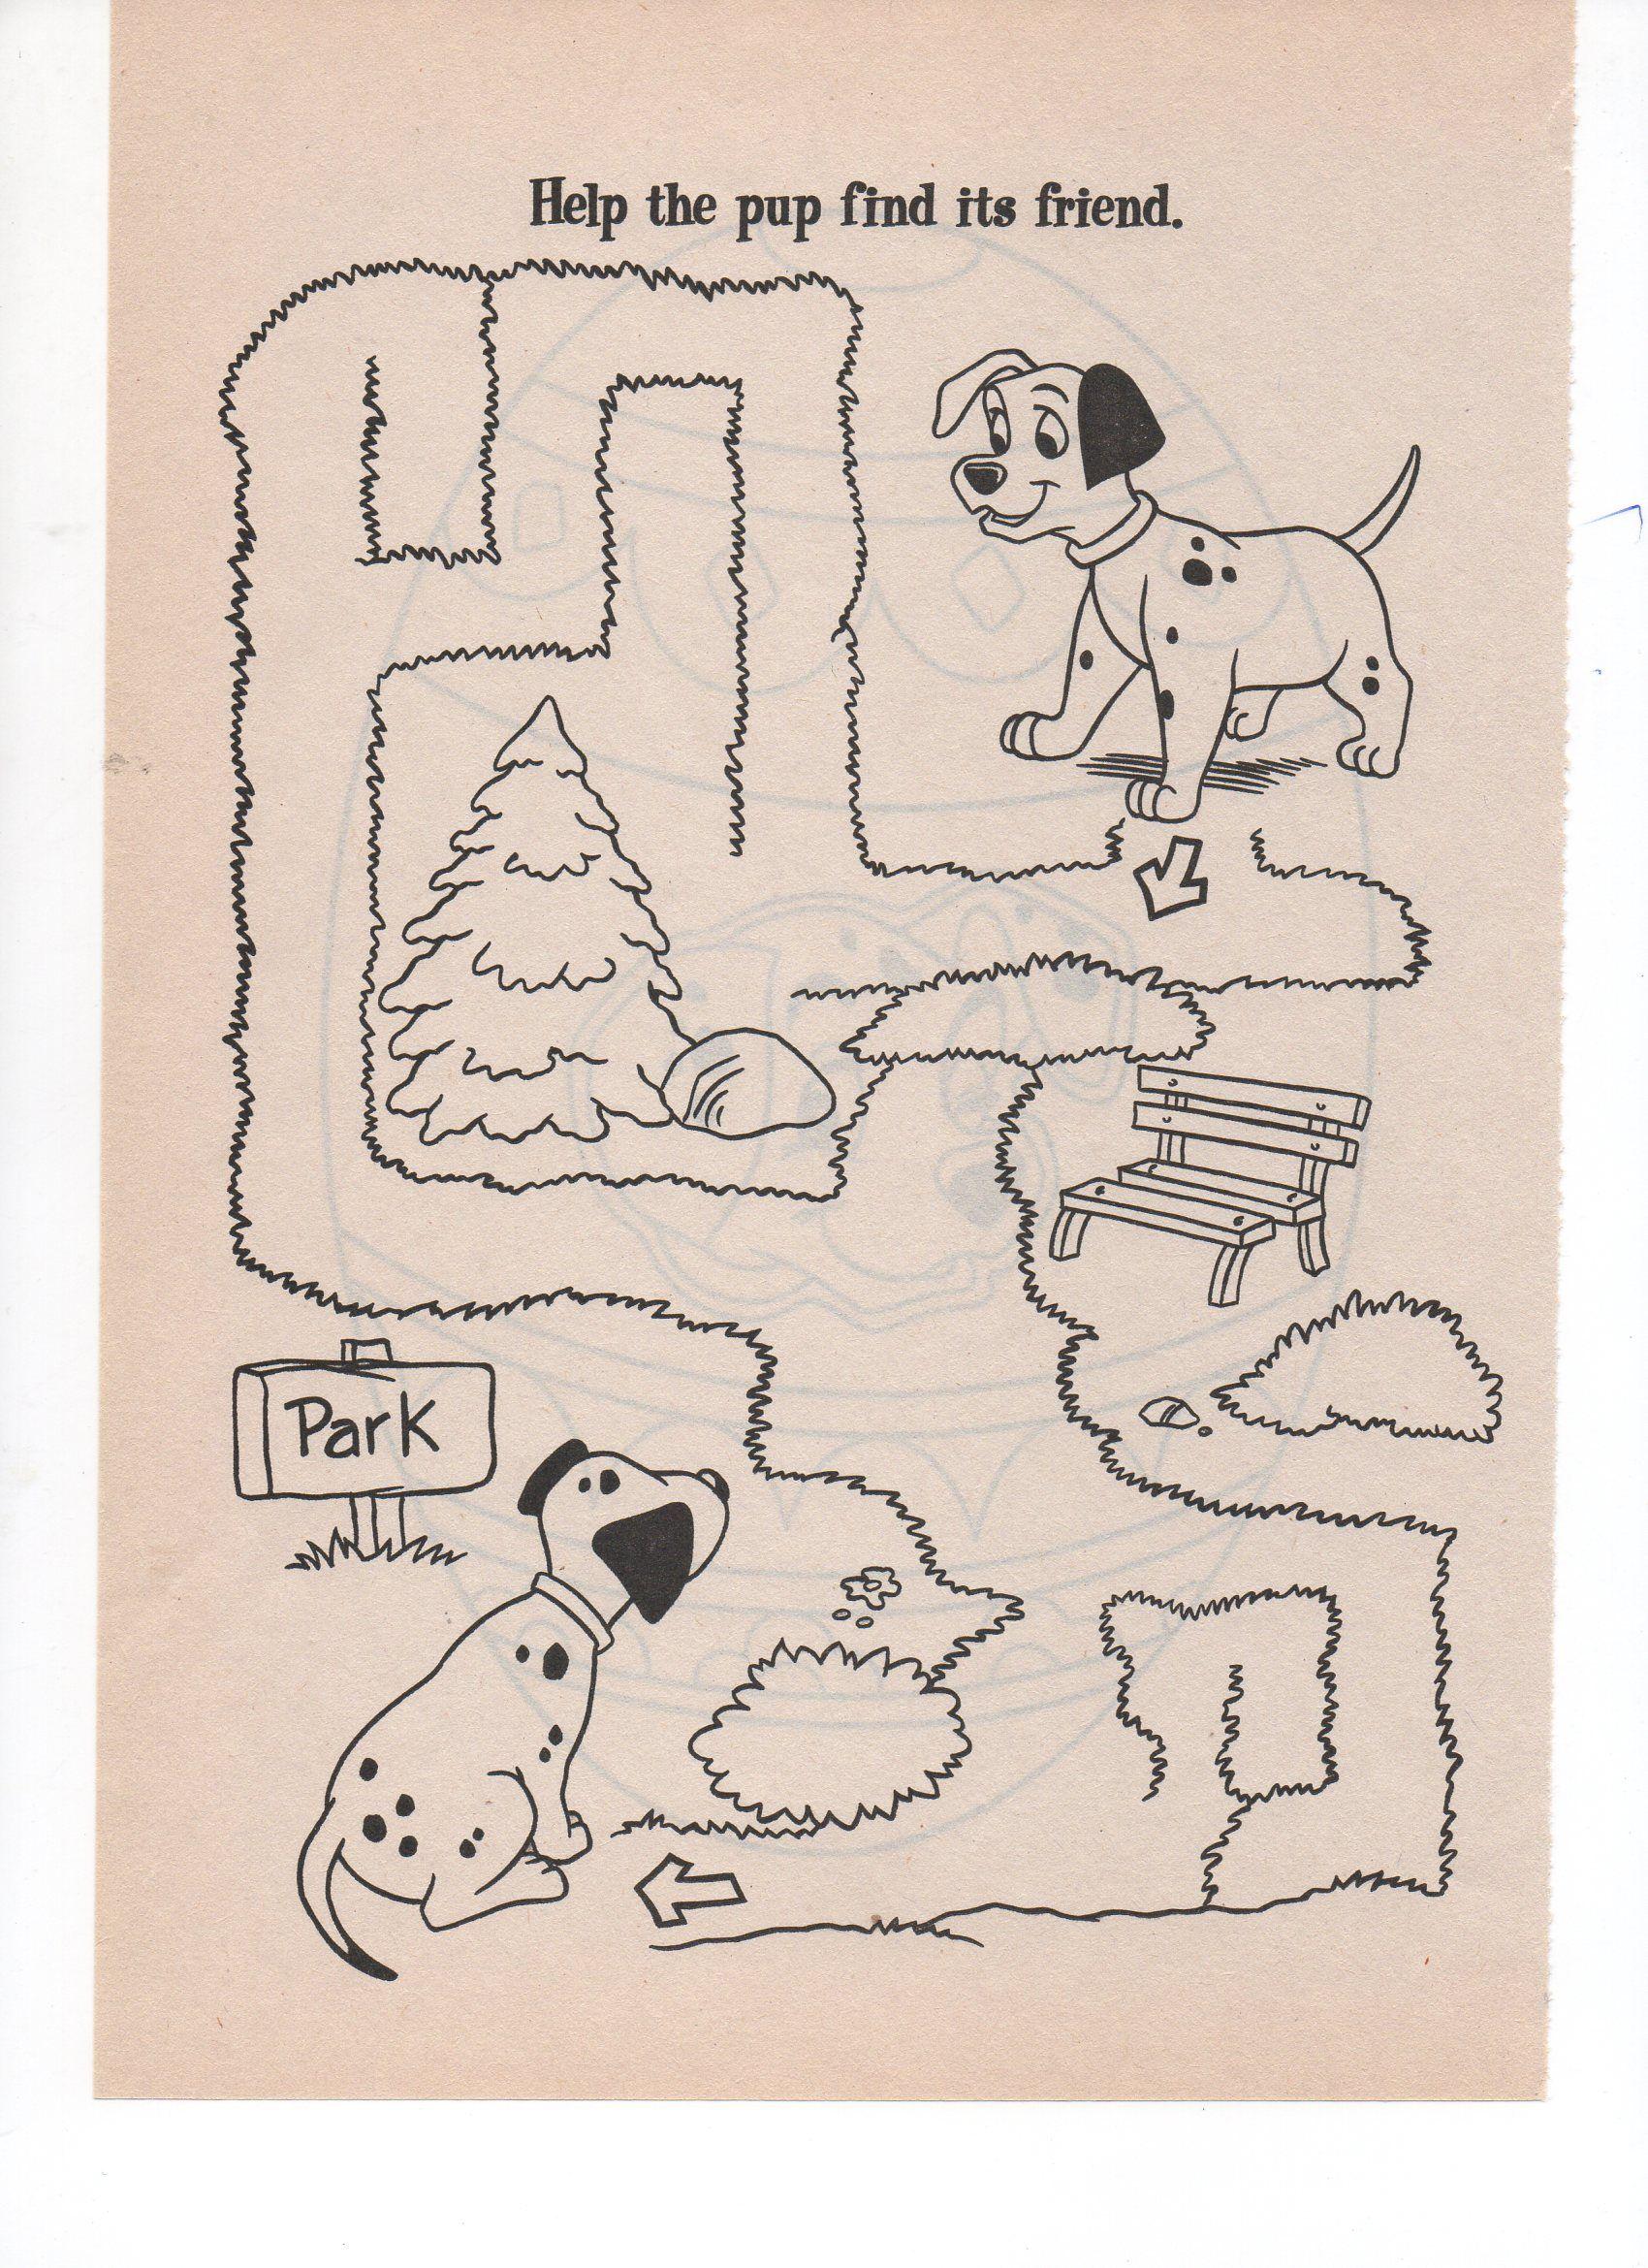 101 Dalmations Maze